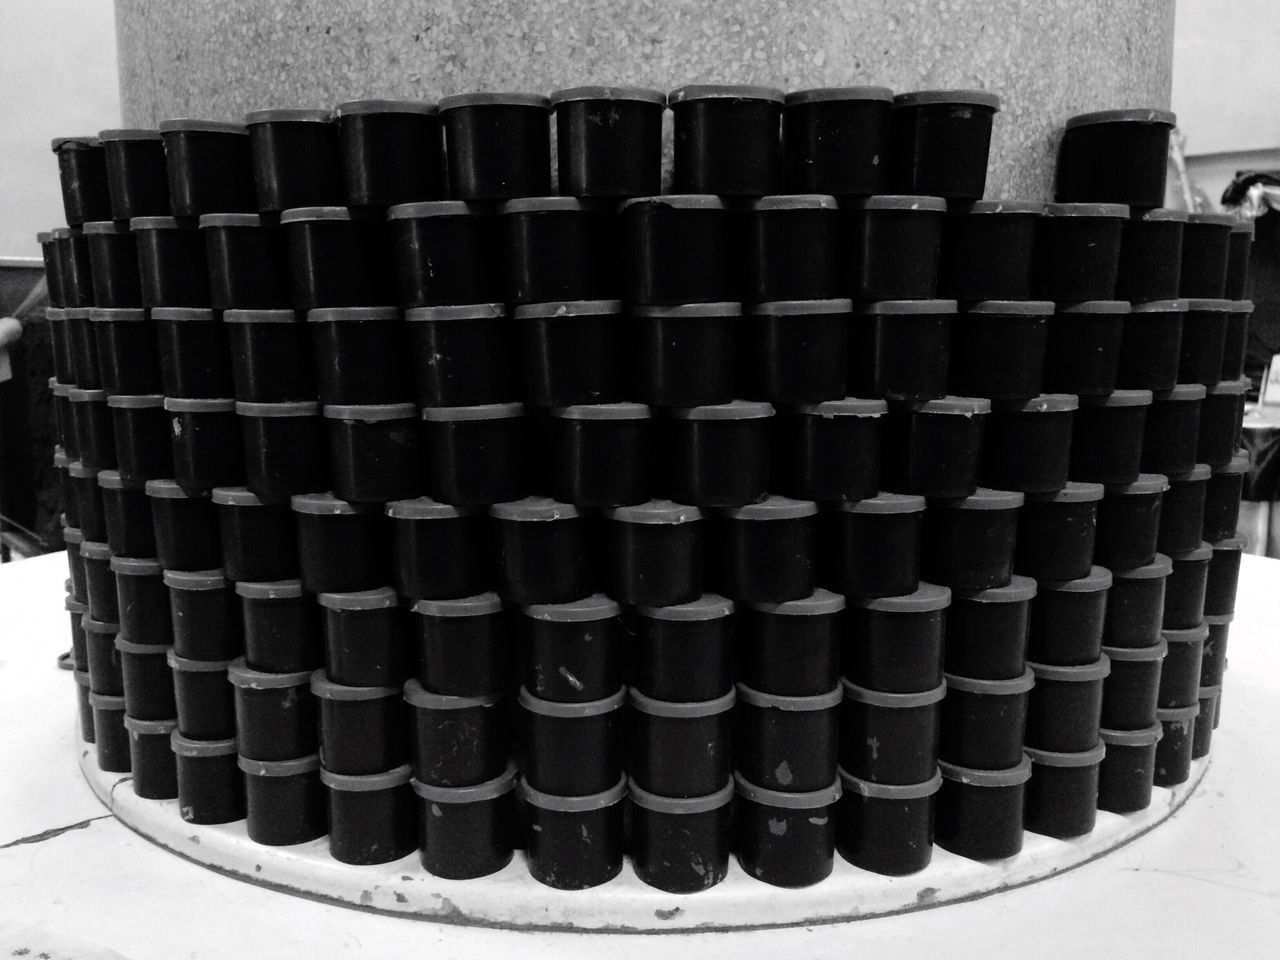 EyeEmNewHere Close-up Box Bottle Stick Column Roll Blackandwhite Black